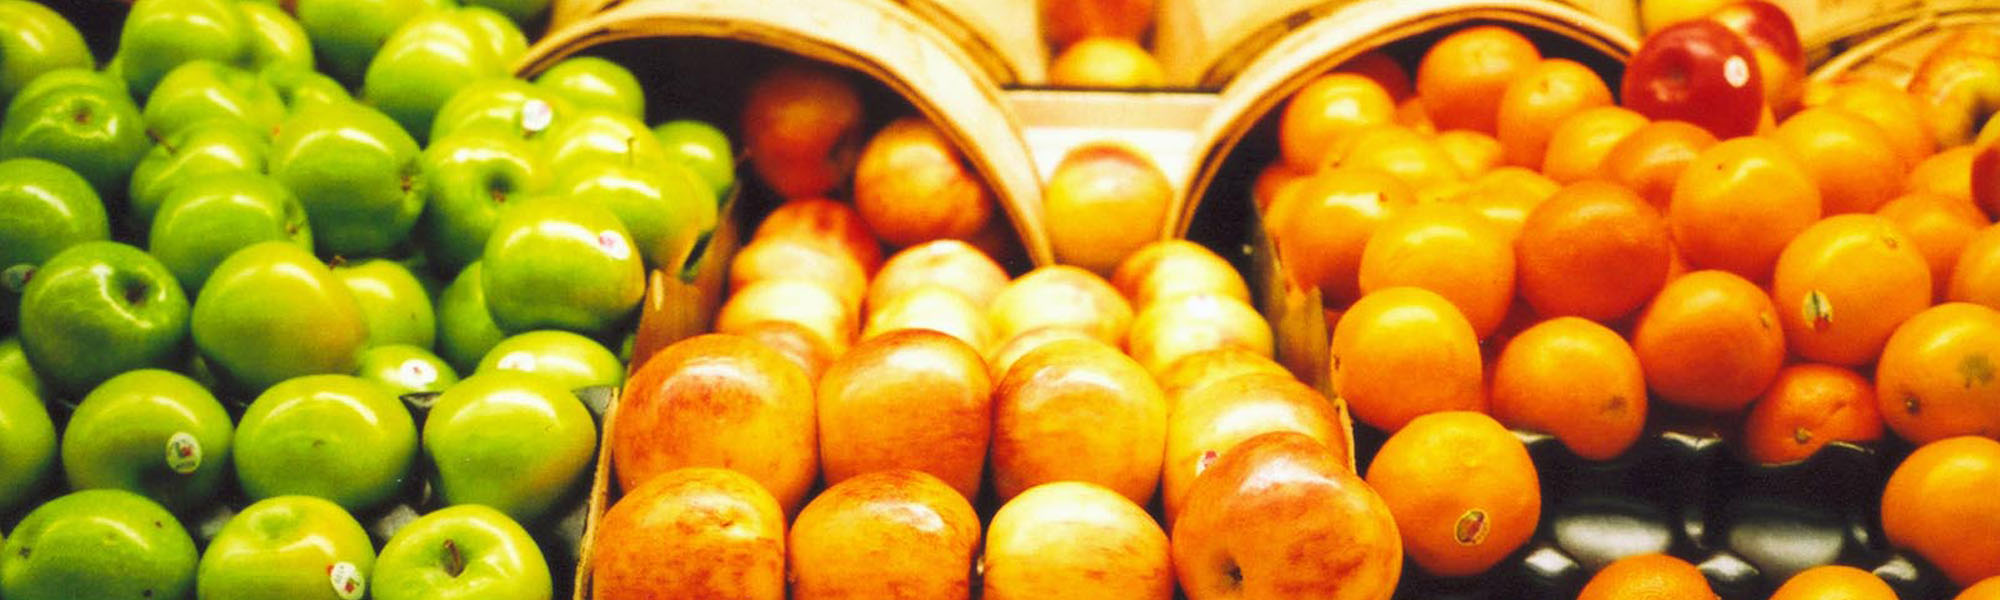 Food Retail Service IPM Specialist